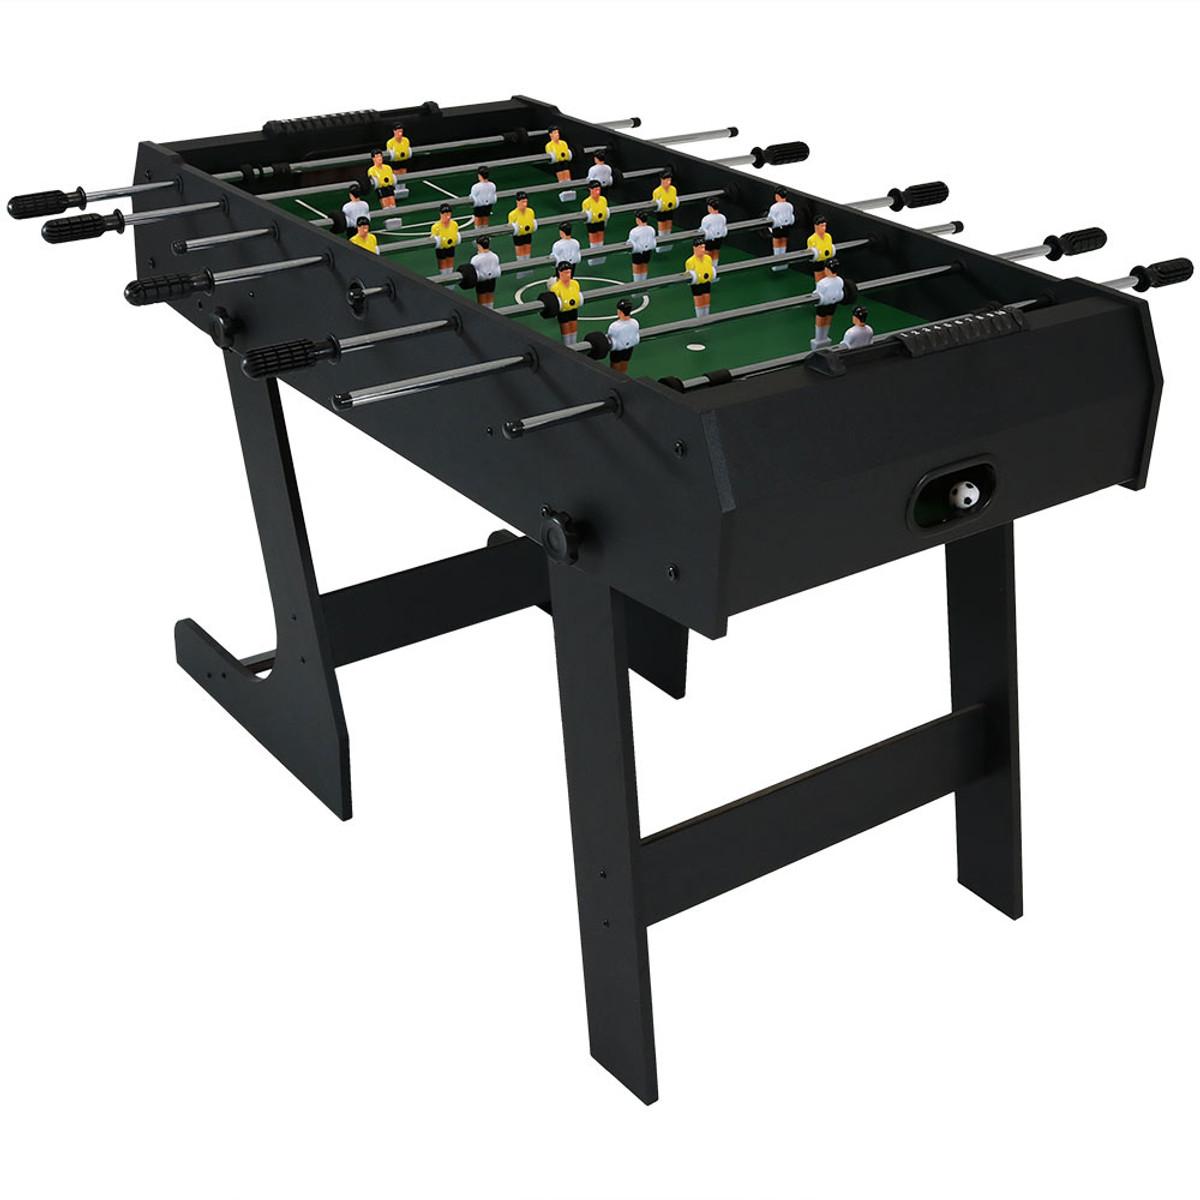 Merveilleux Sunnydaze 48 Inch Folding Foosball Game Table